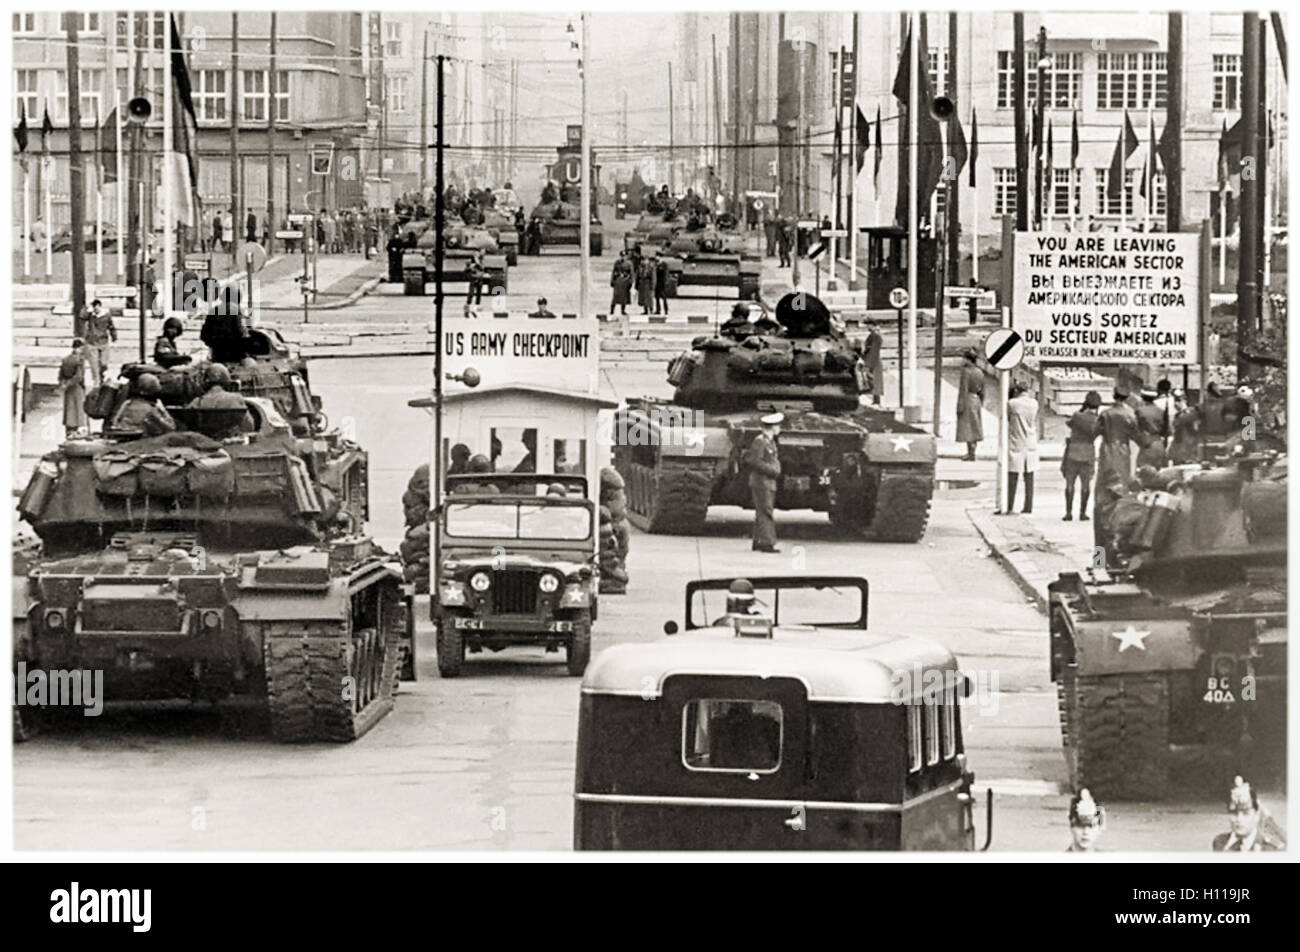 Checkpoint Checkpoint Charlie (C) punto de cruce entre Berlín Oriental y Occidental durante la Crisis de Berlín Imagen De Stock